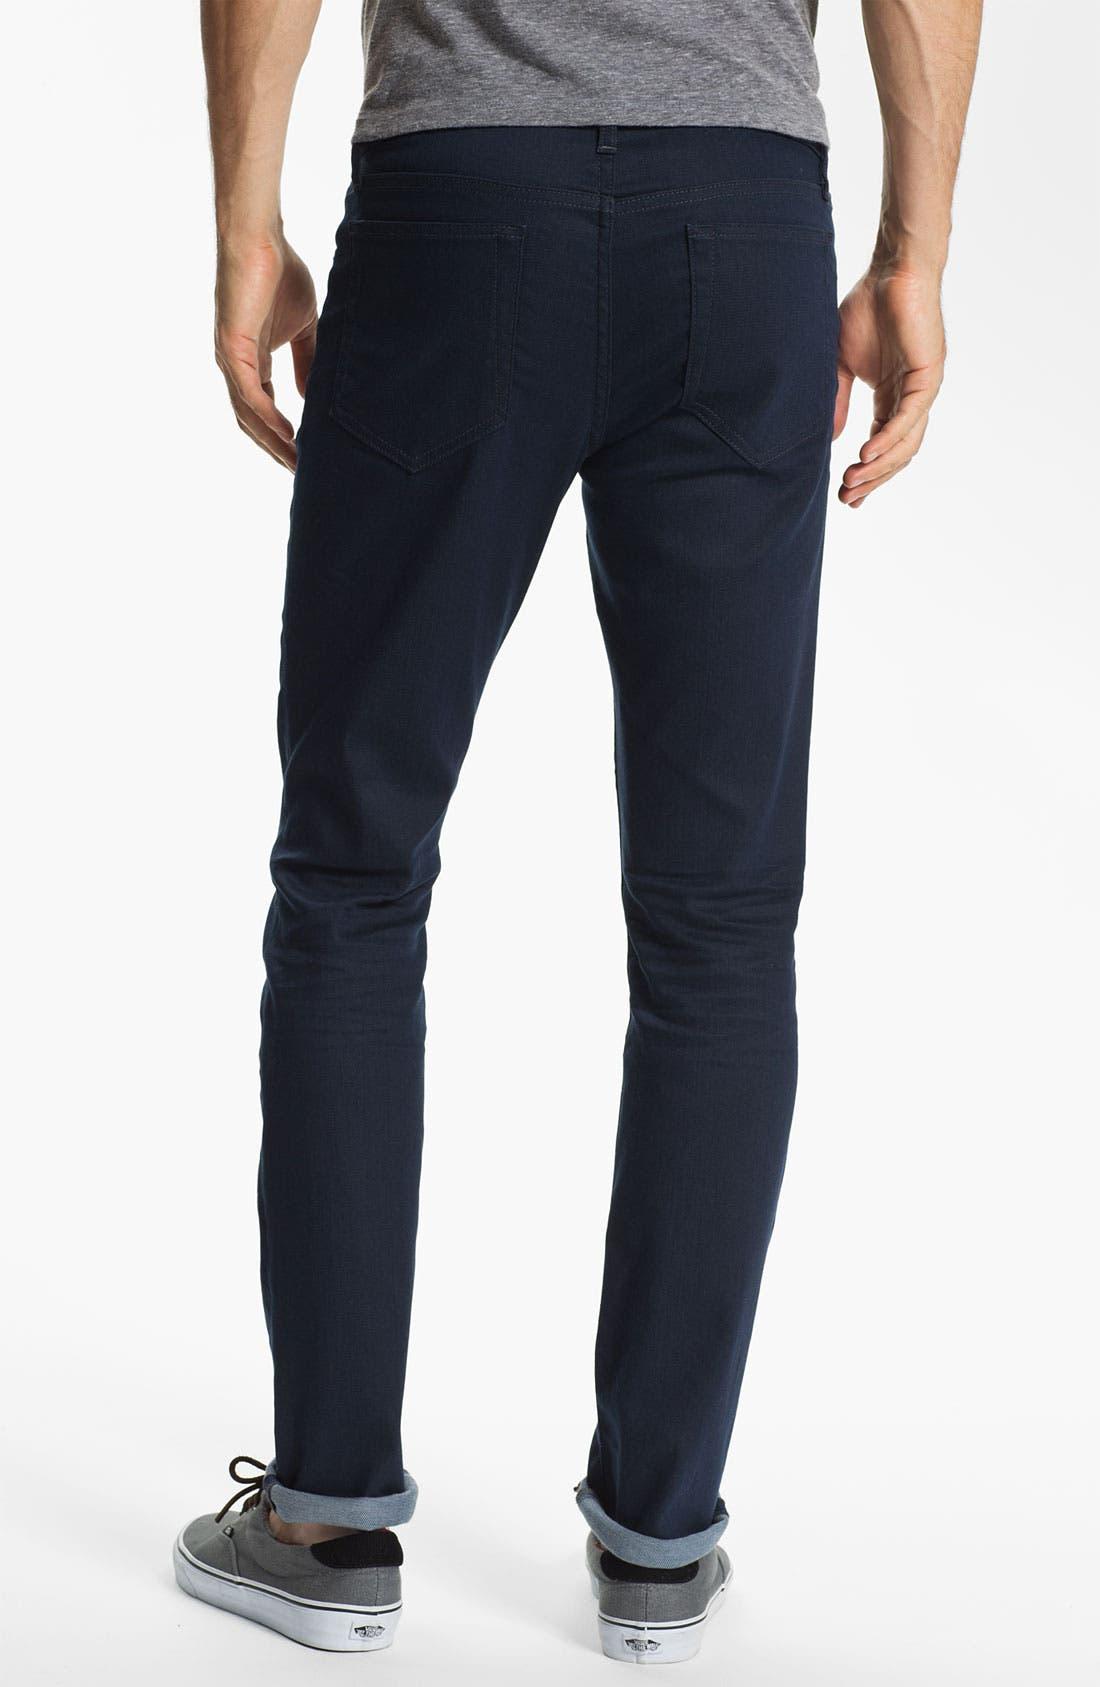 Super Slim Straight Leg Jeans,                             Main thumbnail 1, color,                             020